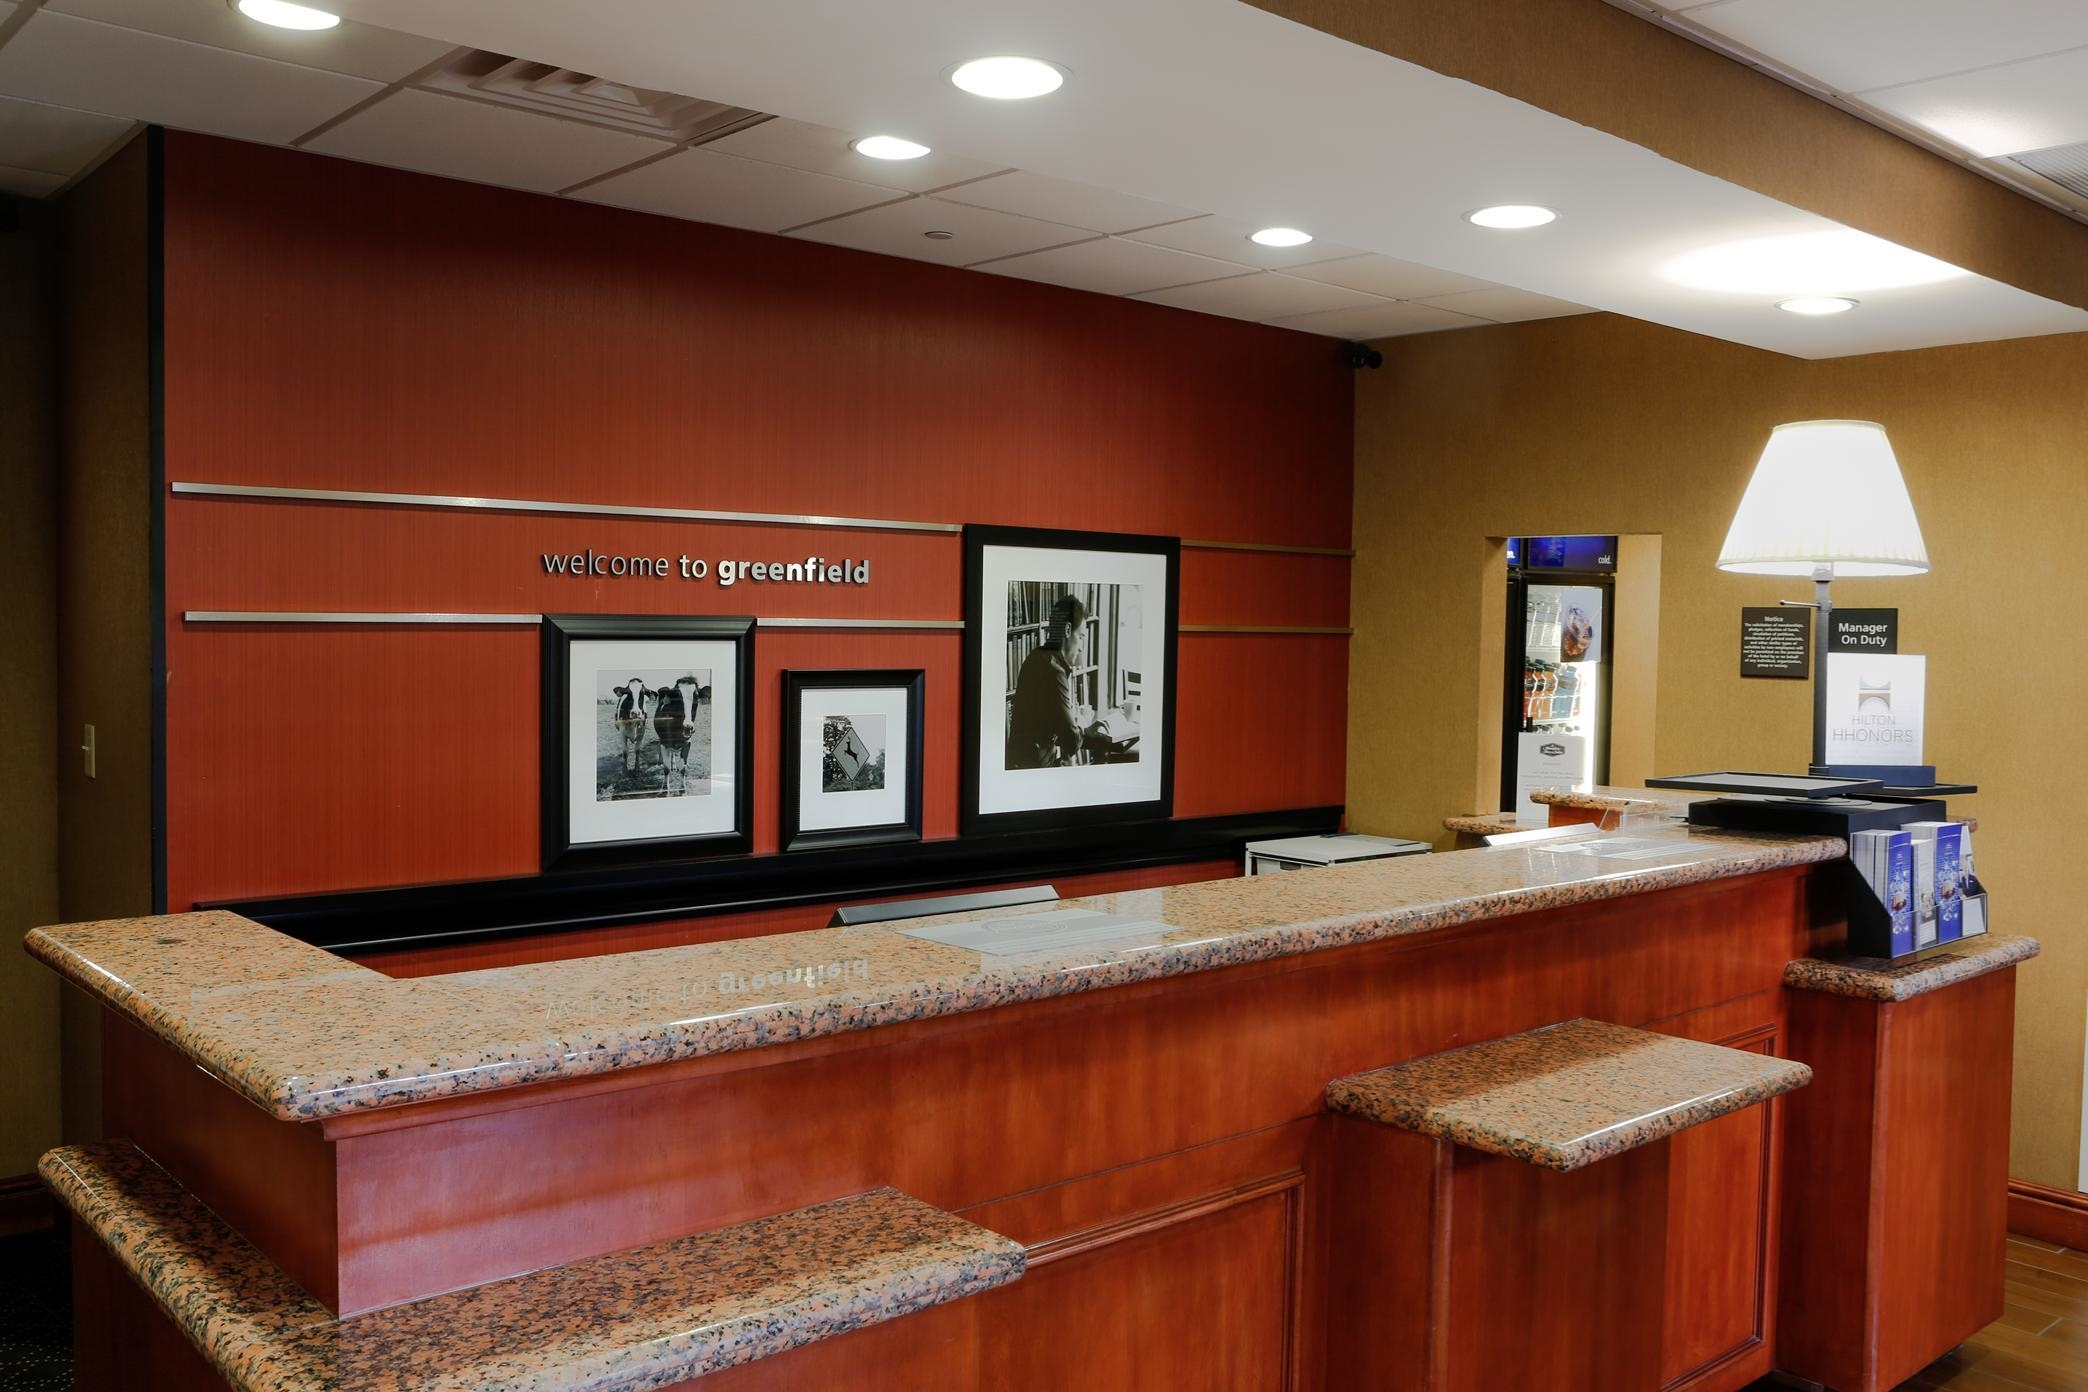 Hampton Inn & Suites Greenfield image 1